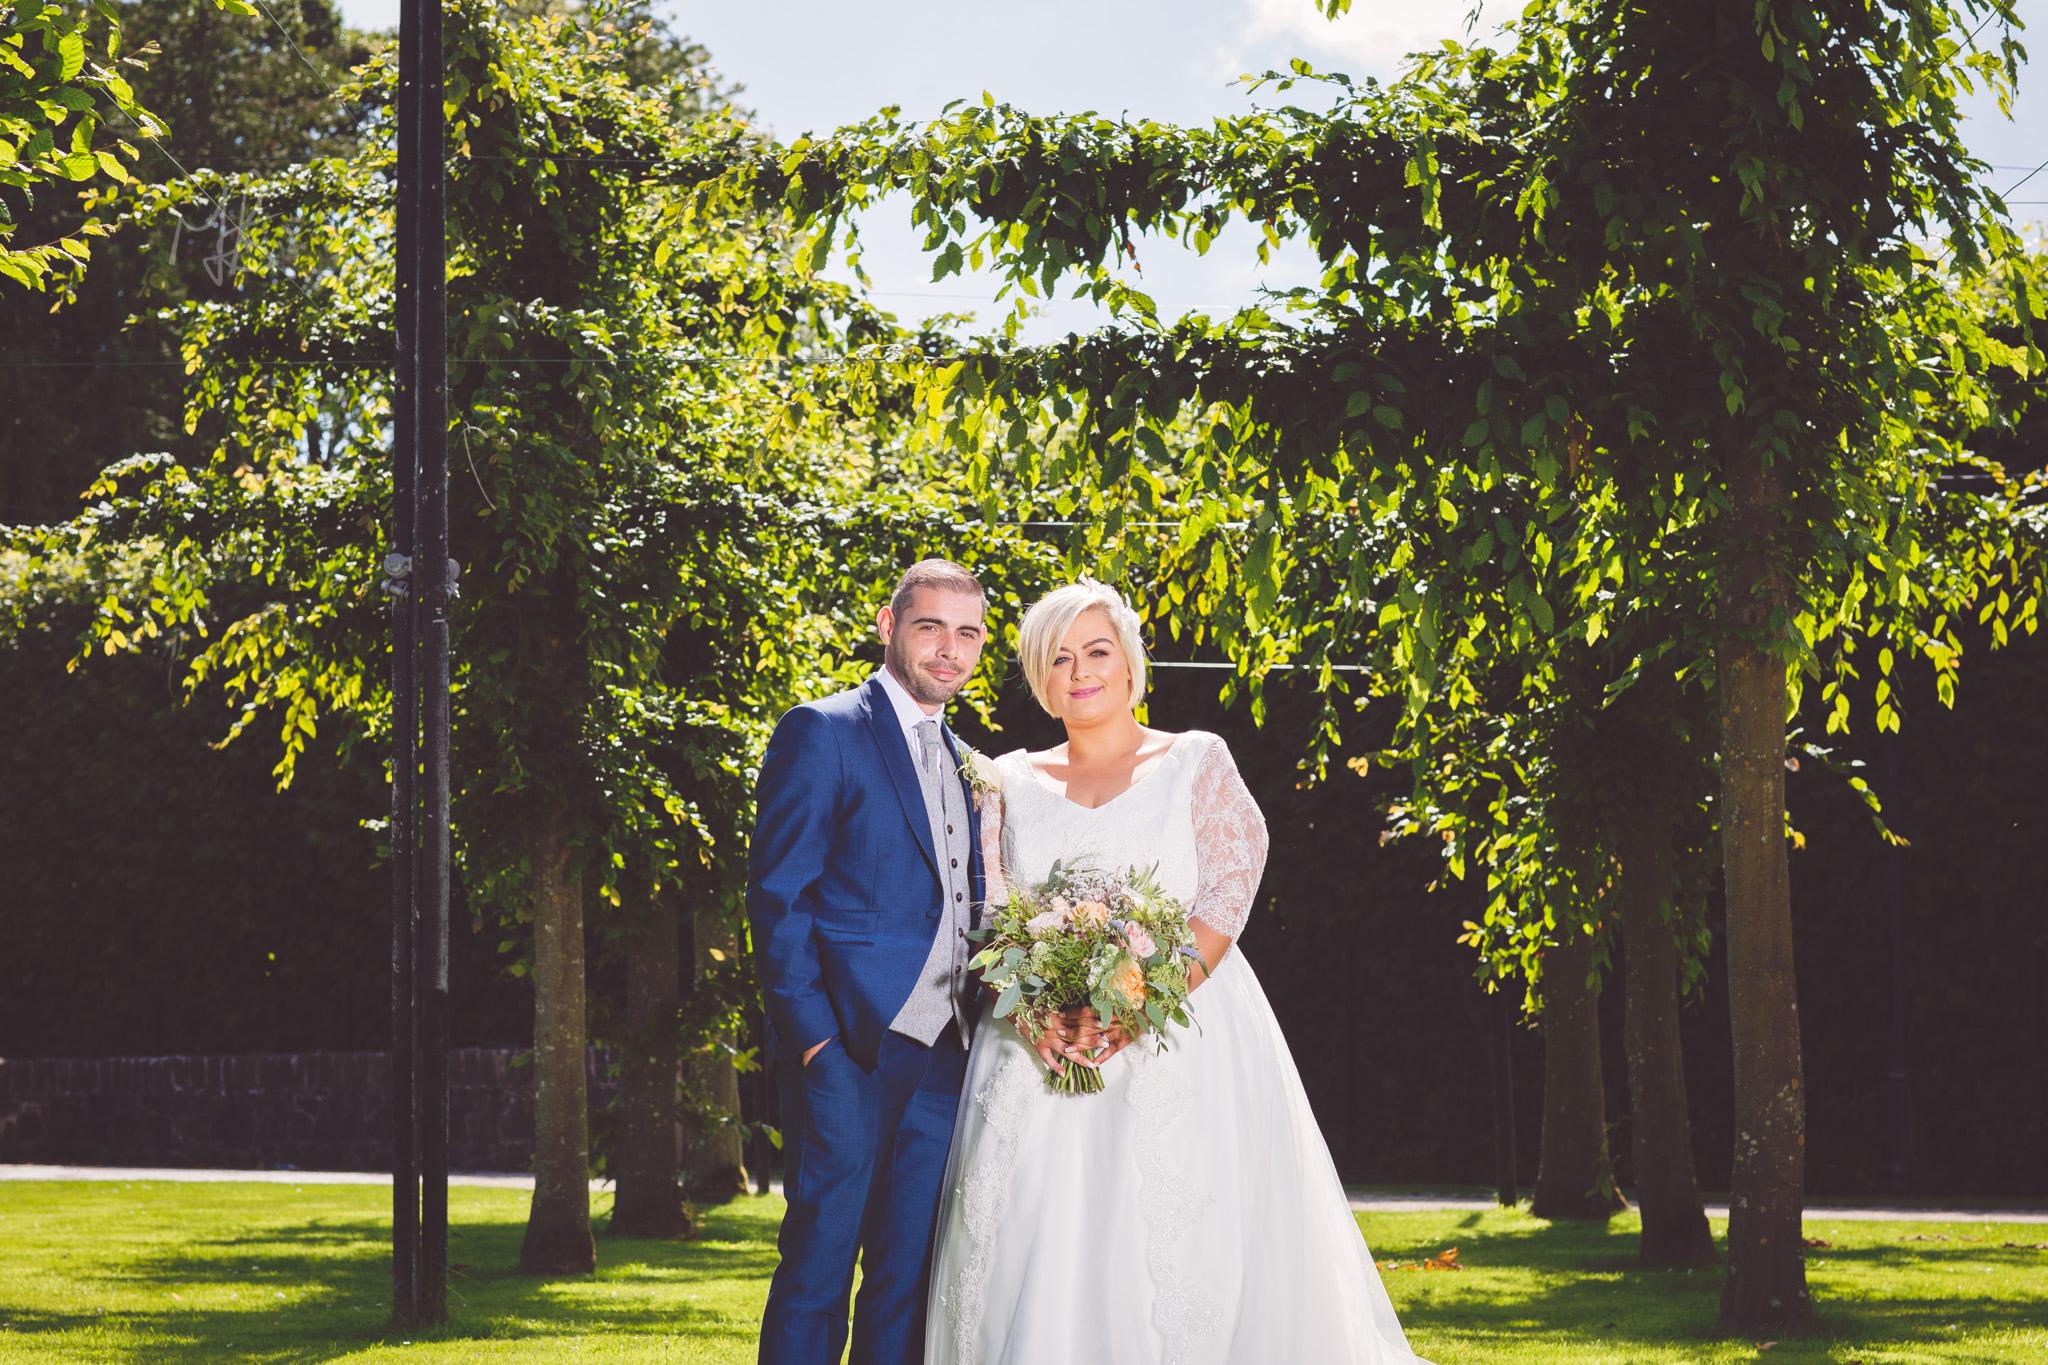 Northern-Ireland-Wedding-Photographer-Mark-Barnes-Ballymena_wedding-photography-Leighinmohr-House-Seamas_Alanna_For-web-30.jpg